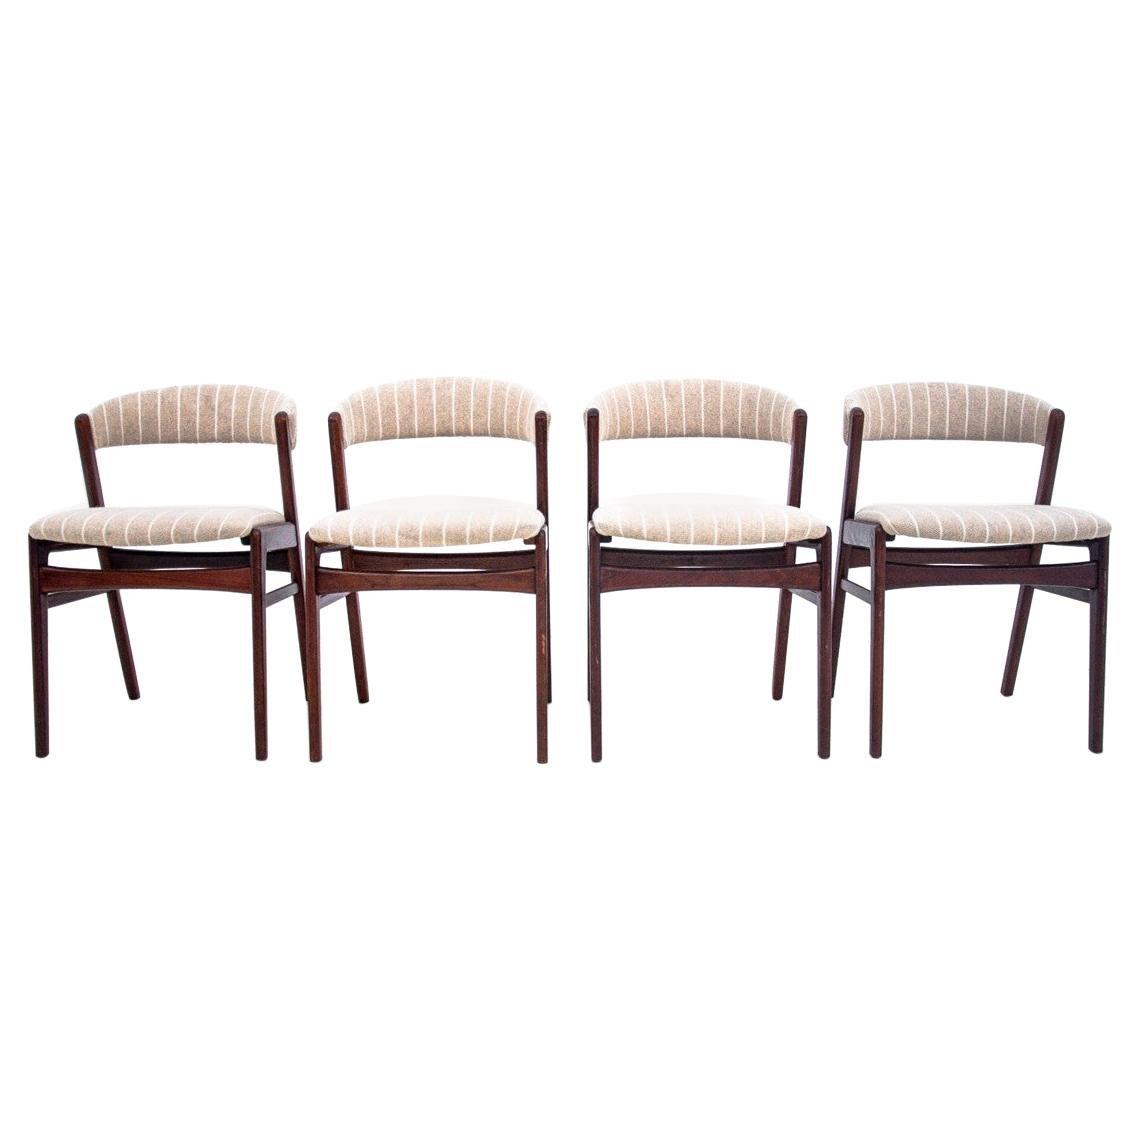 Set of Four Teak Danish Dining Chairs, 1960s